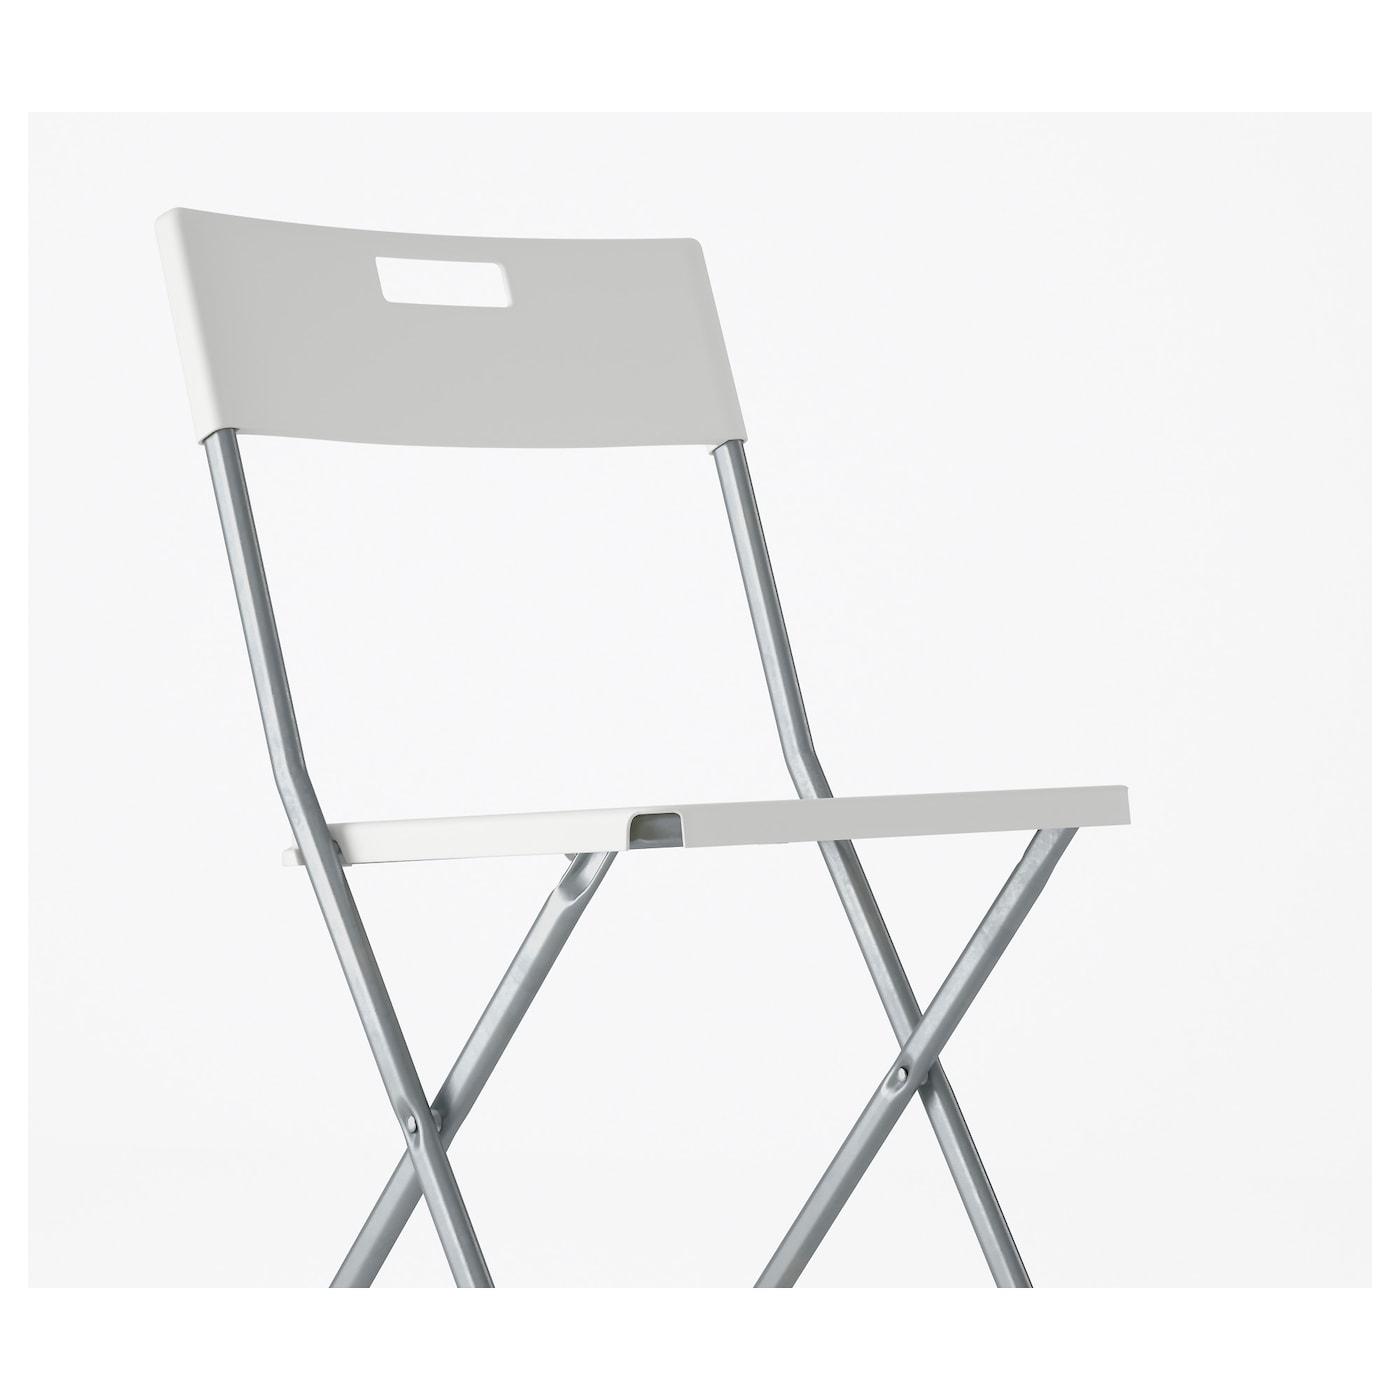 Gunde Silla Plegable Blanco Ikea